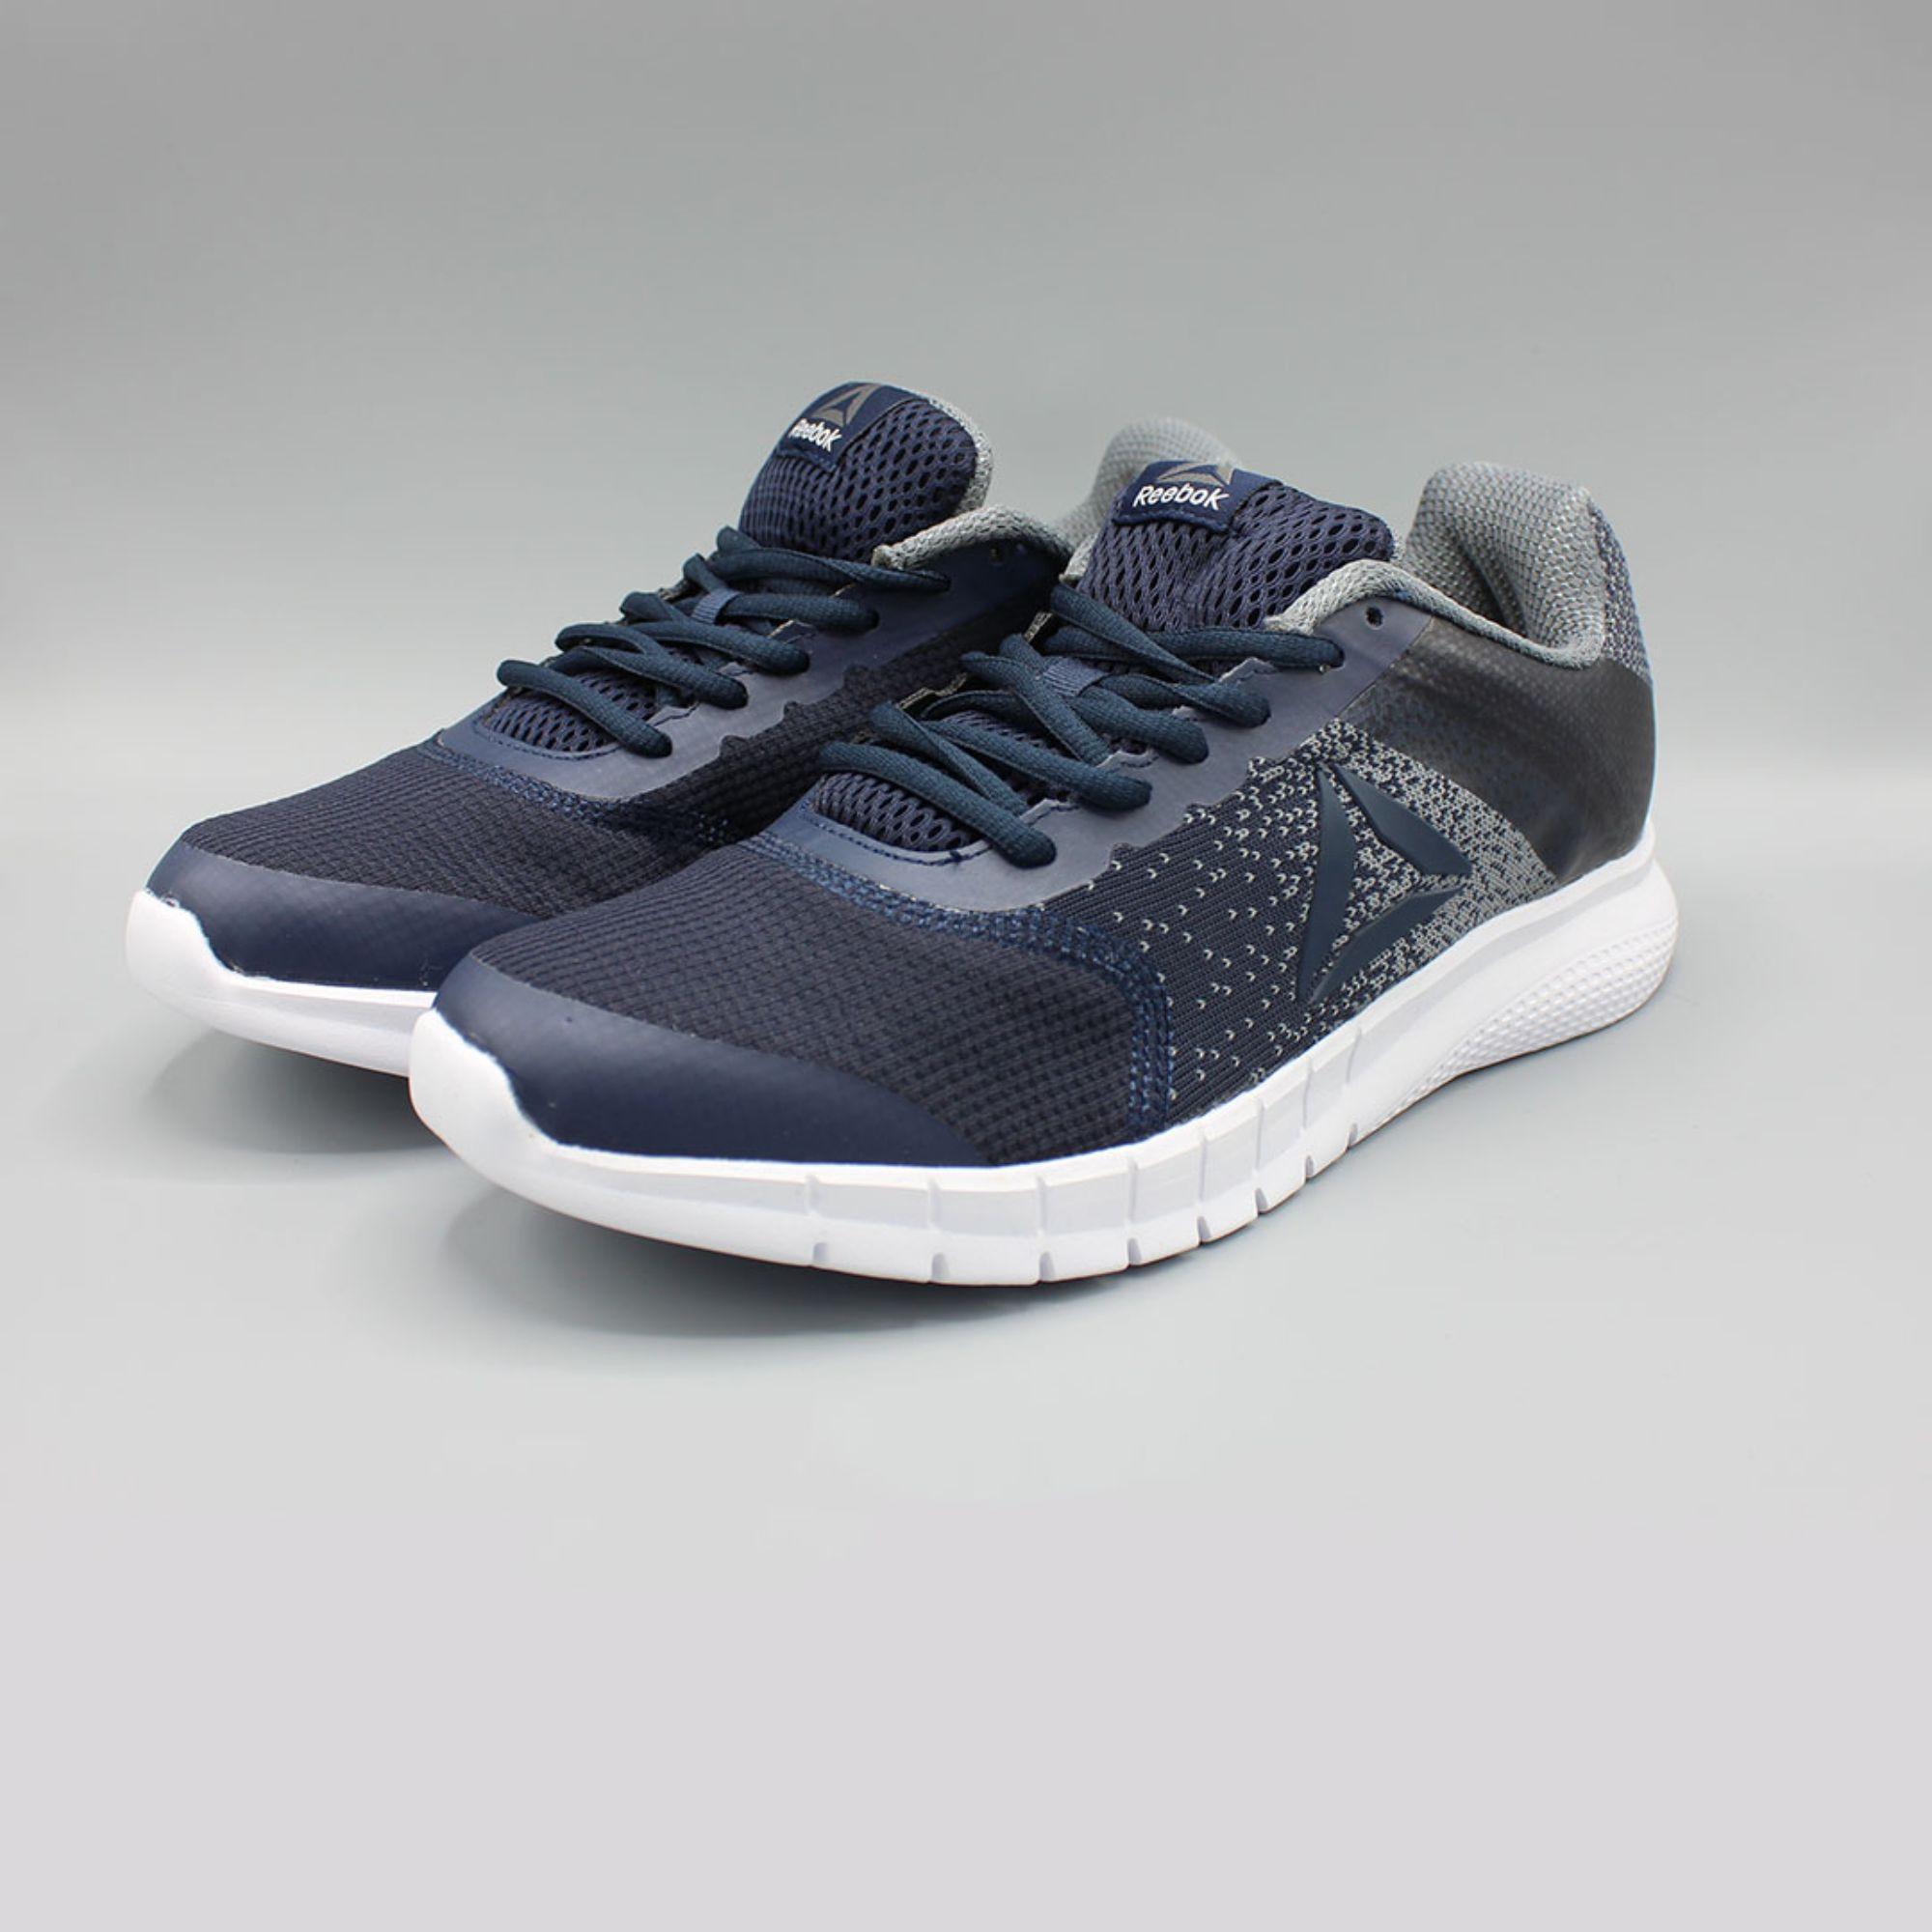 42dc88156c40 Best Men s Running - Training Shoes Price in Pakistan - Daraz.pk